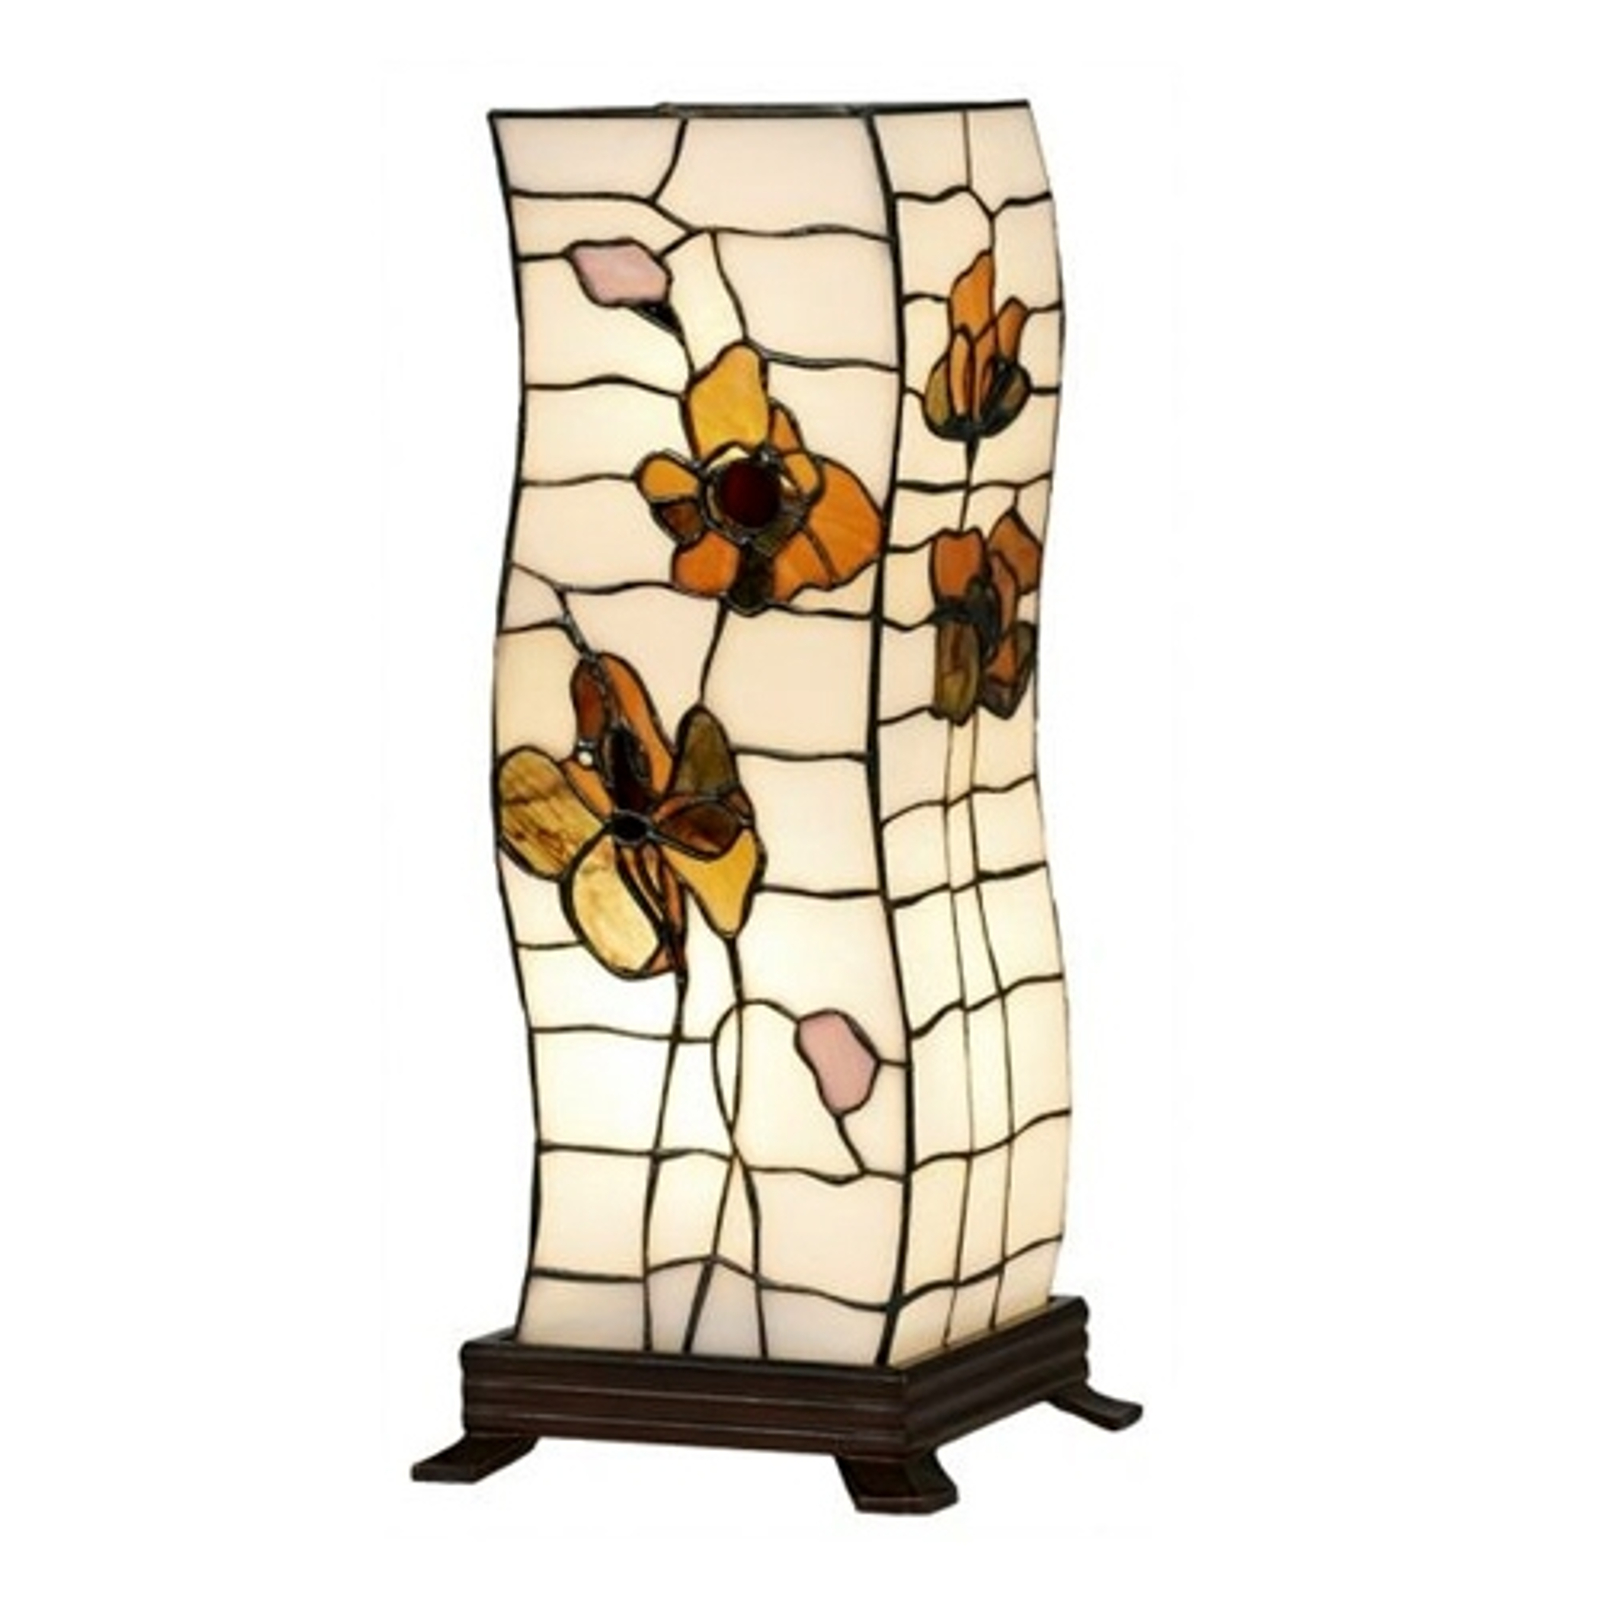 Tafellamp Blossom in Tiffany-stijl